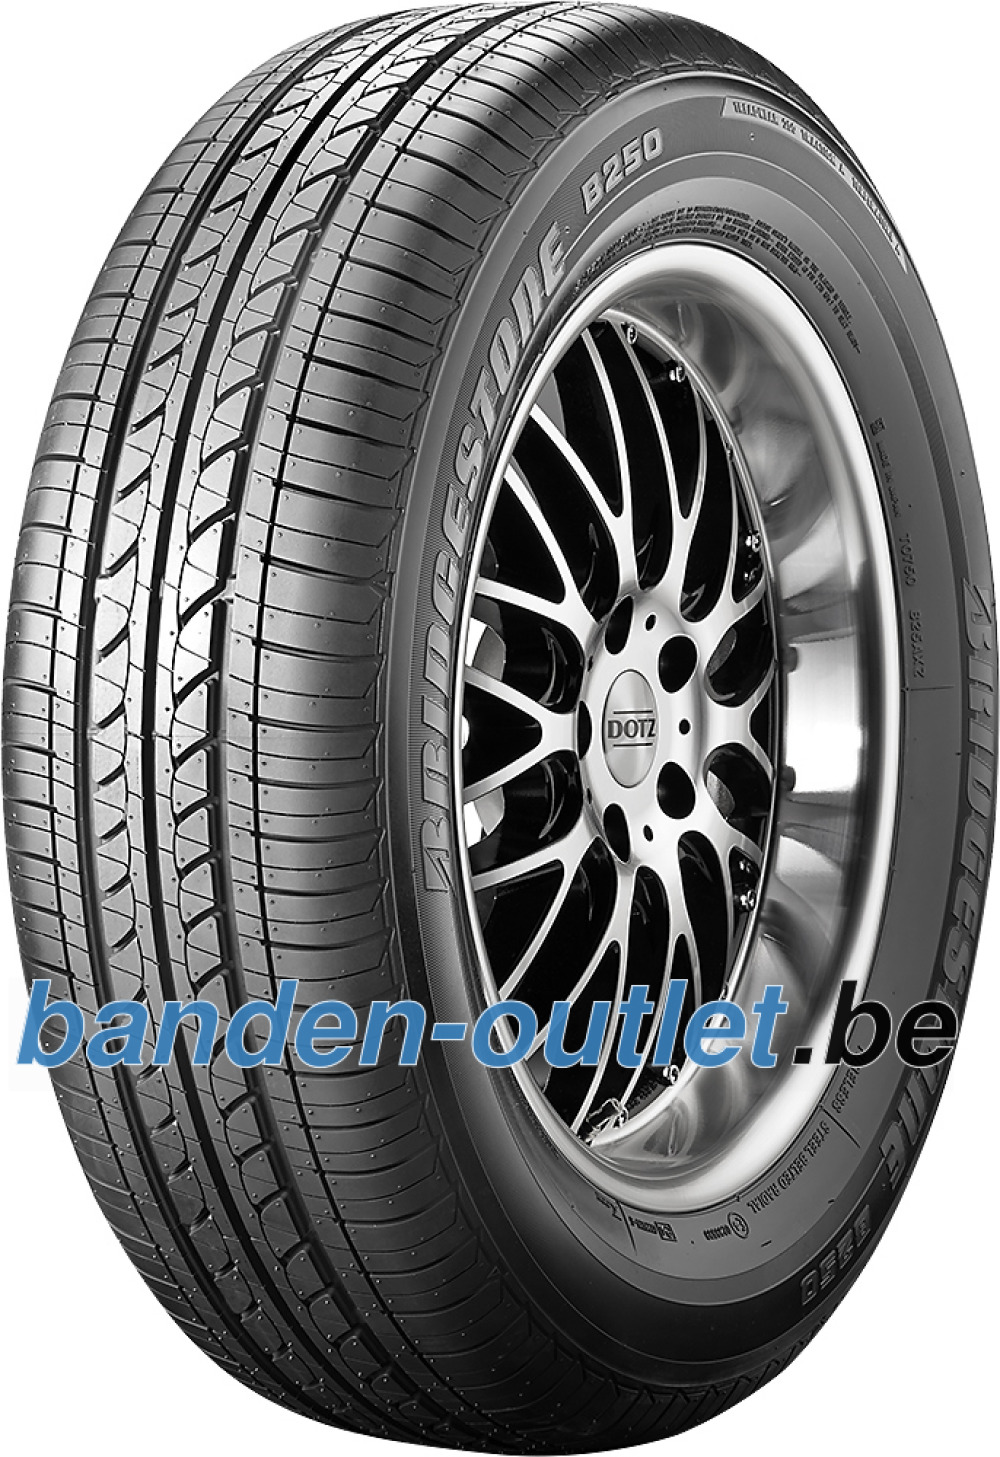 Bridgestone B 250 ( 175/55 R15 77T met velgrandbescherming (MFS) )